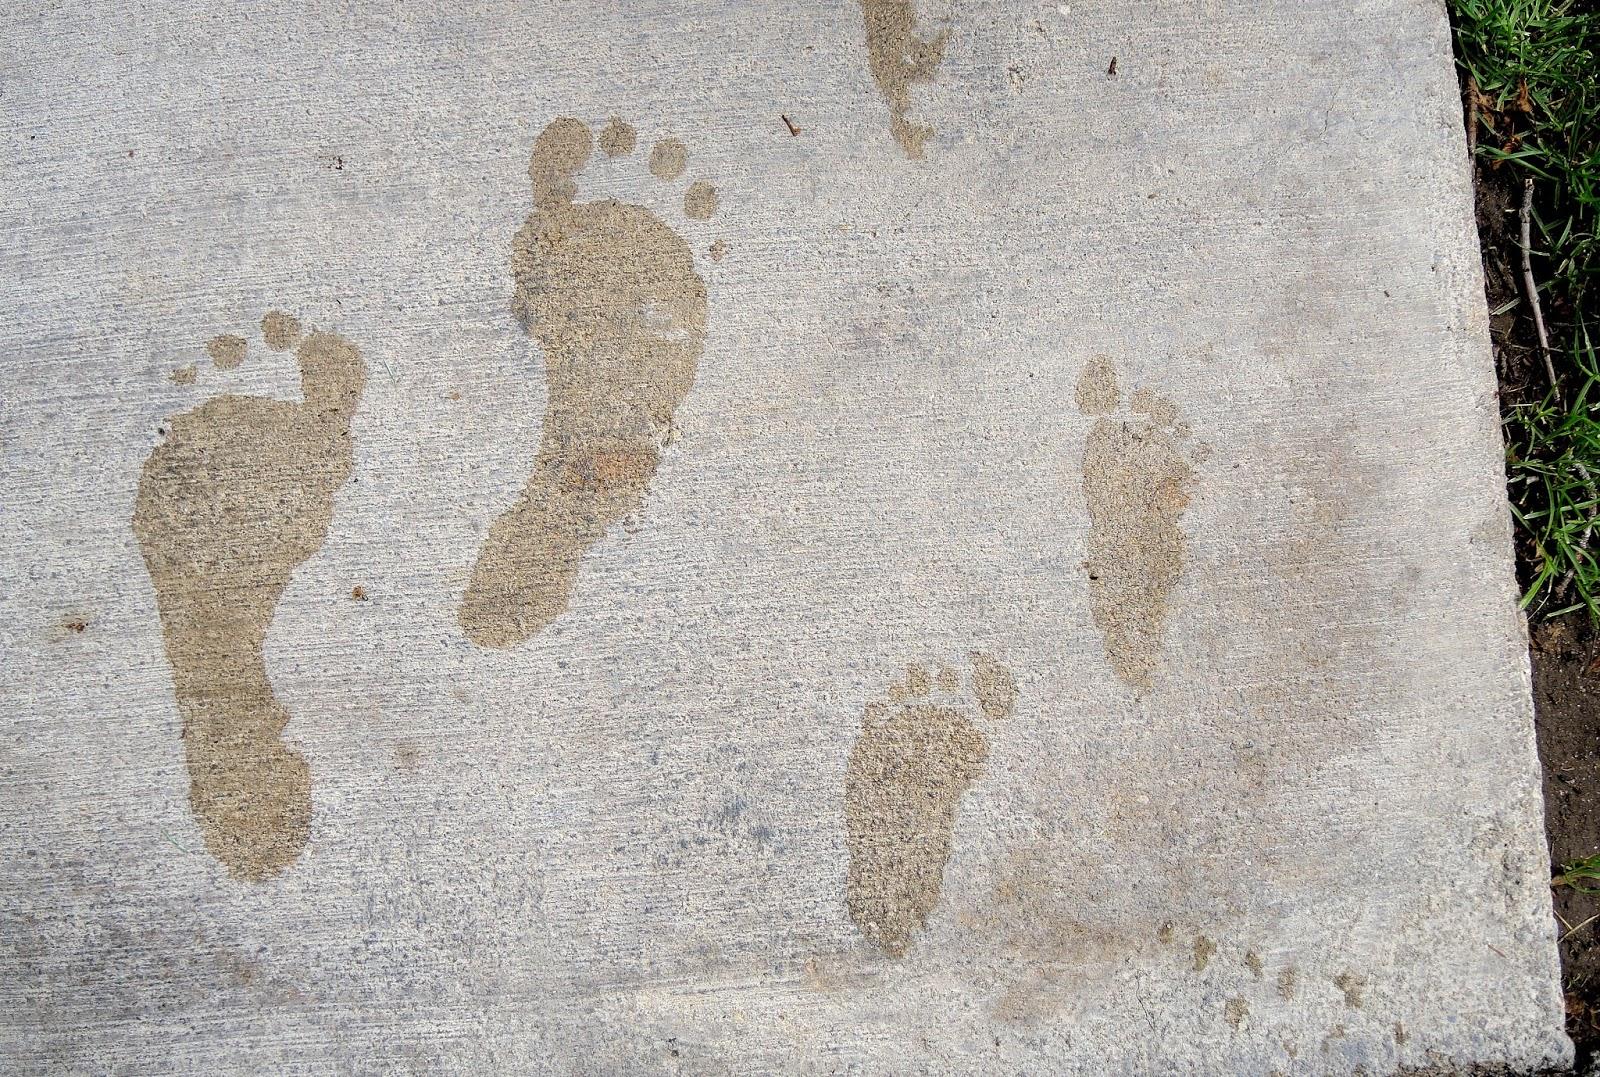 Grandma and Carter barefoot footprints.